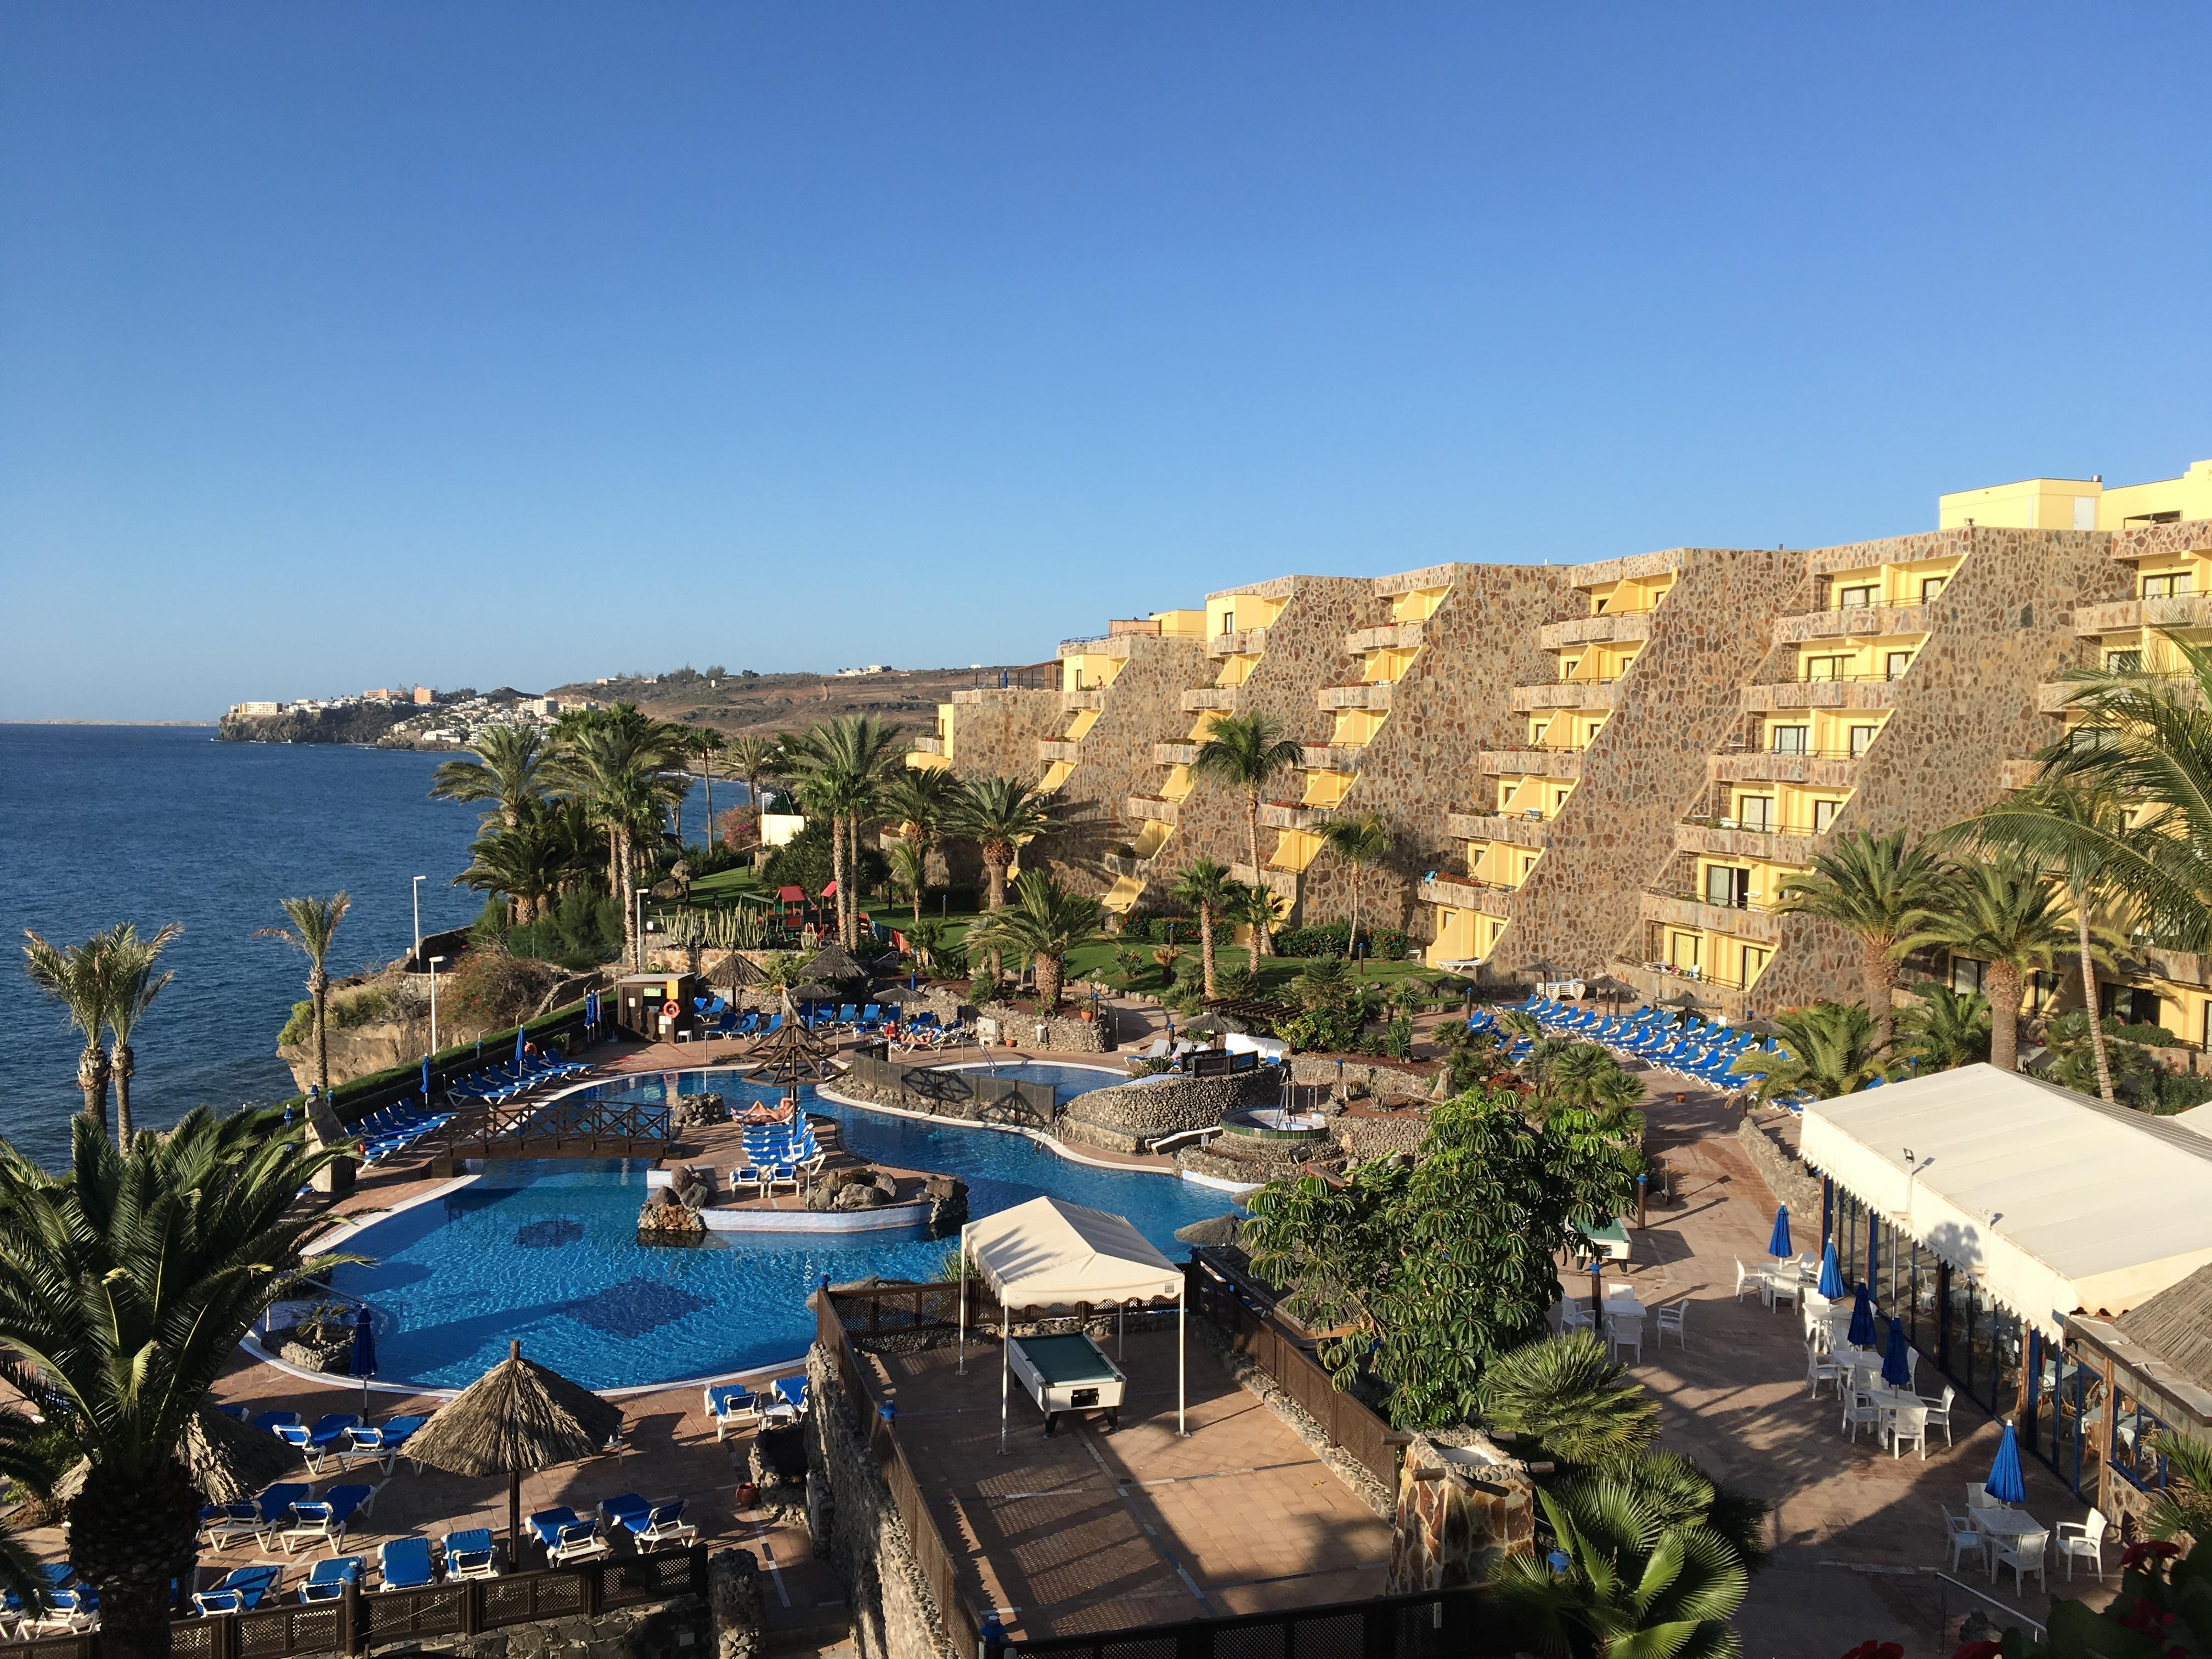 bluebay beach club - reviews, photos & rates - ebookers